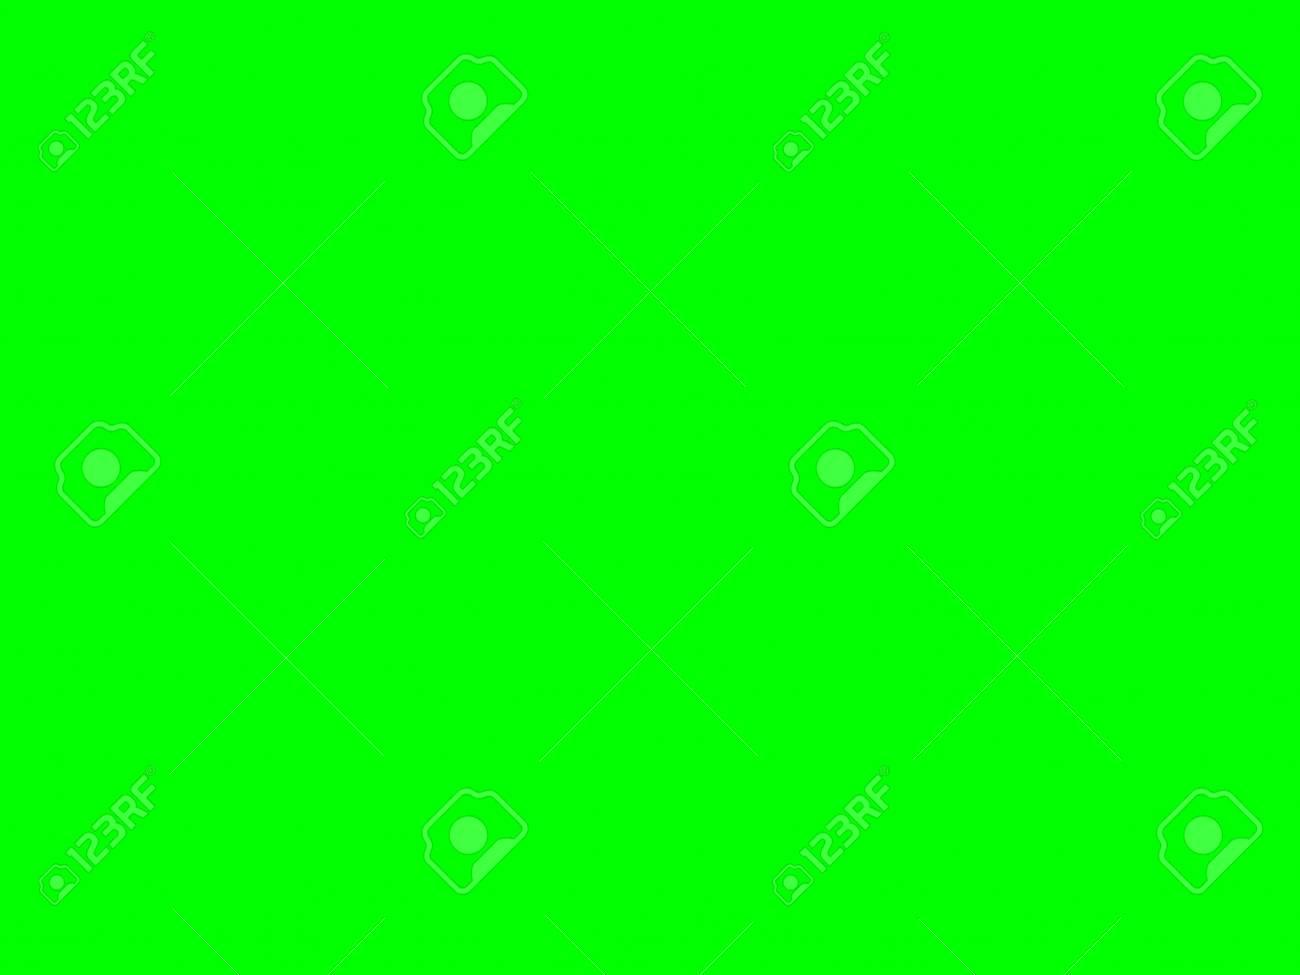 Green Screen  Green Background  Green Screen Stock Footage Video